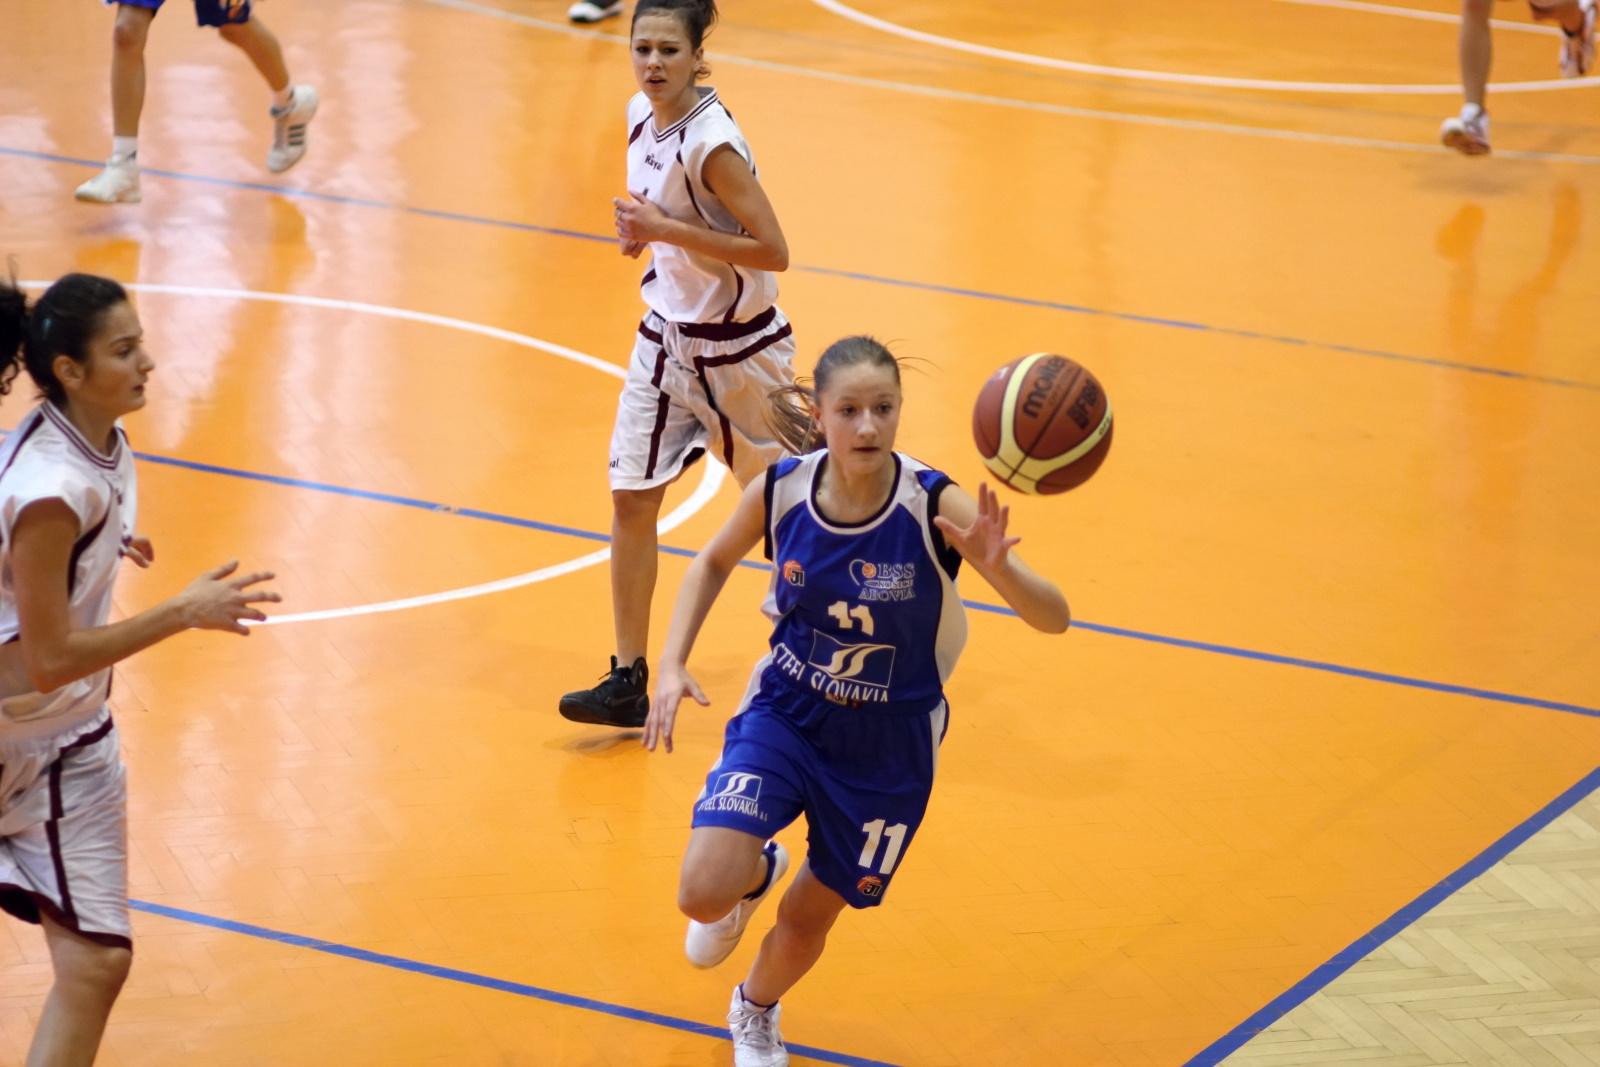 bk-zvolen-abovia-kosice-ziacky-basketbal-2011-4